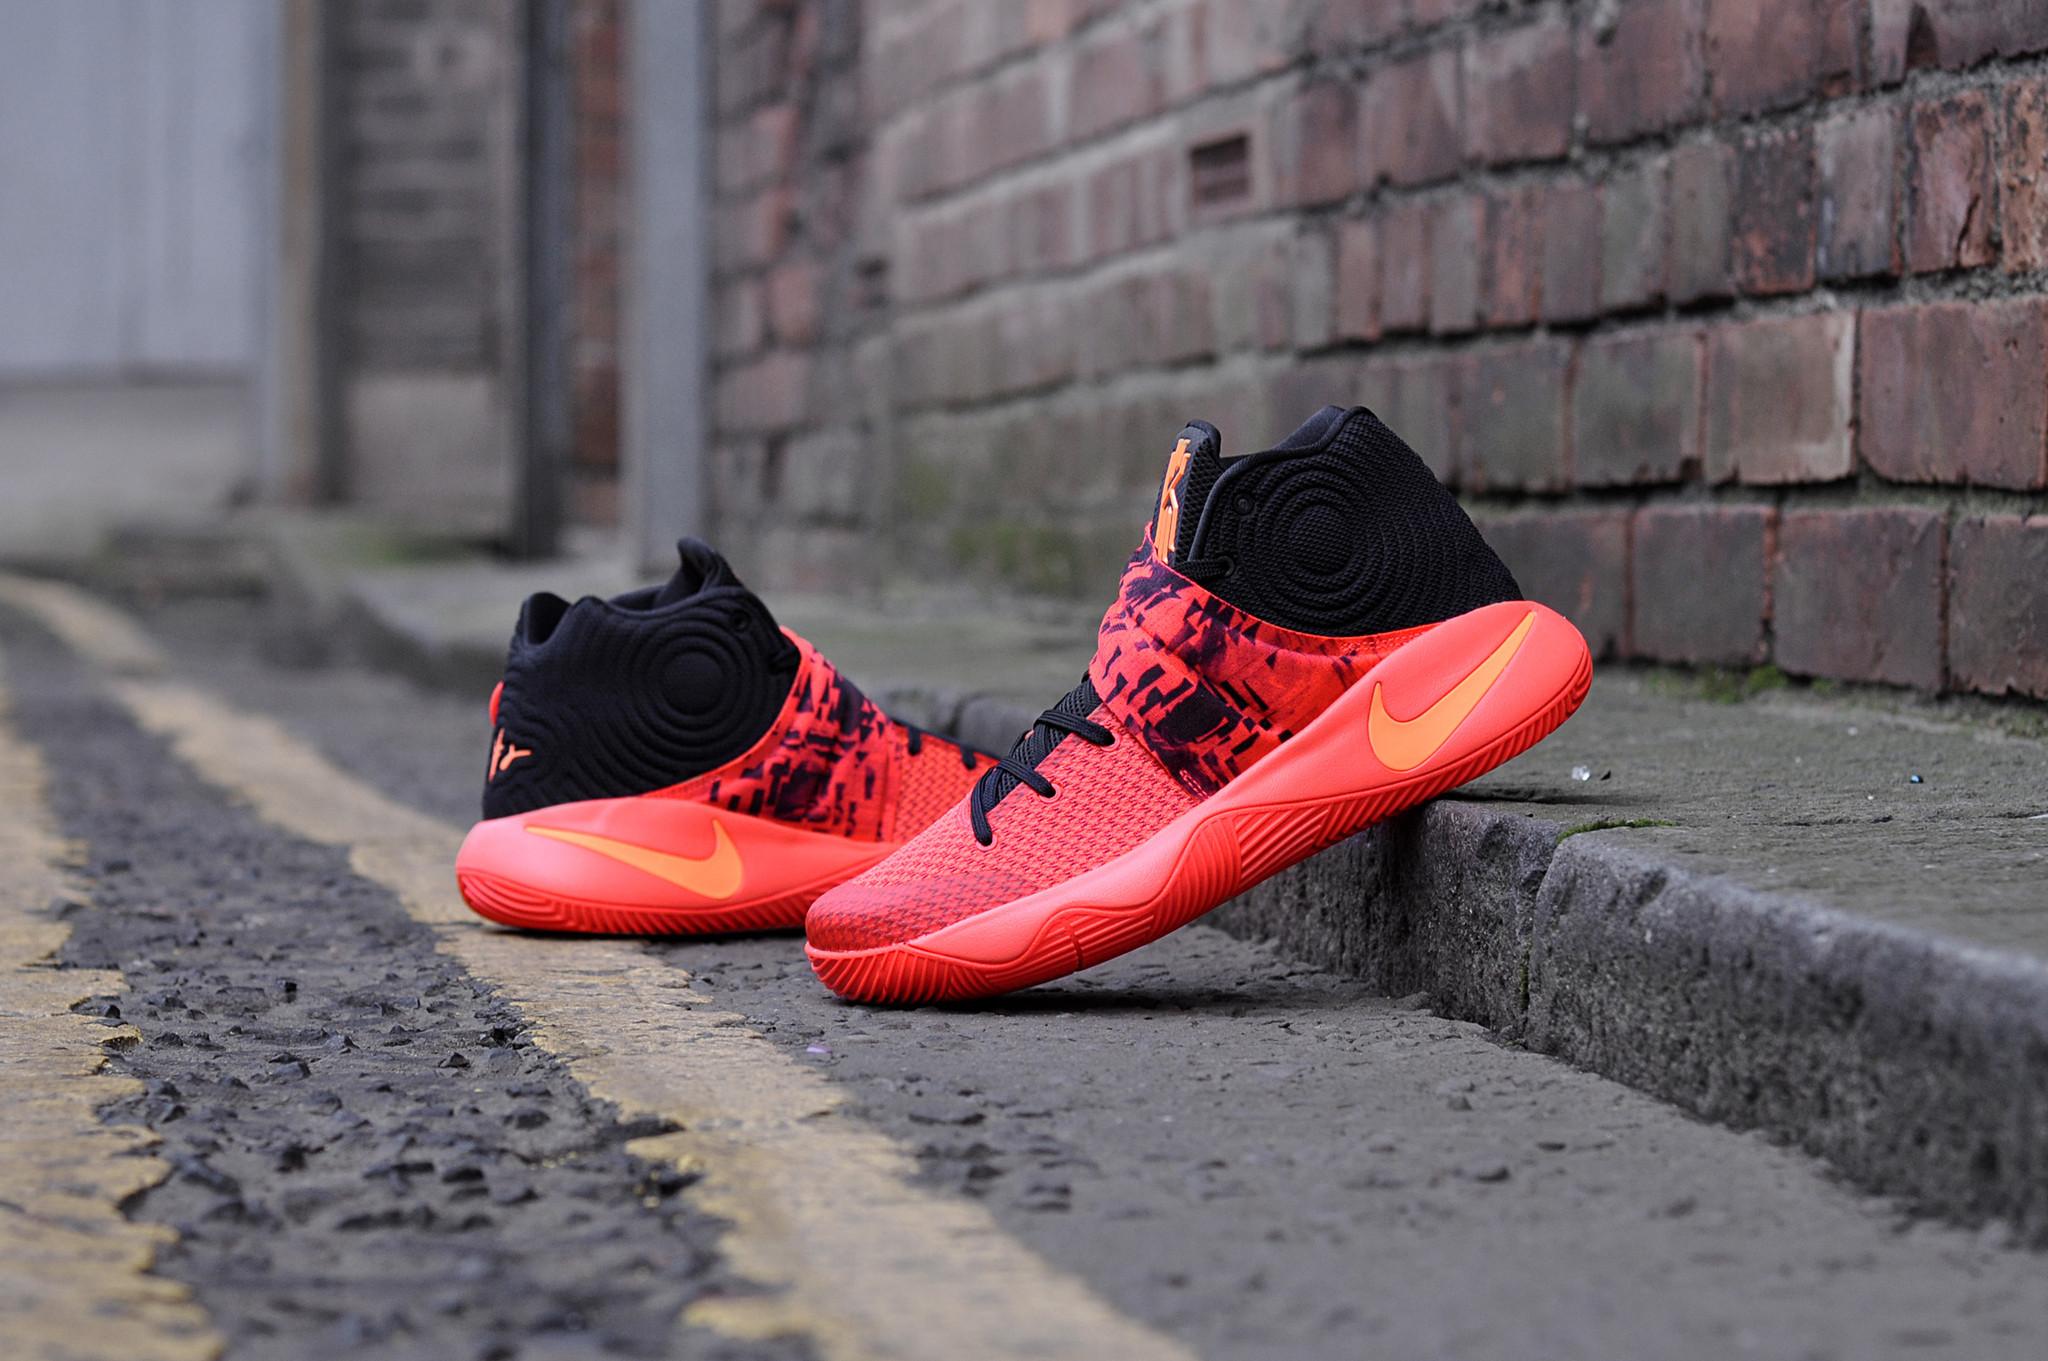 94260ec3c1b7a Nike Kyrie 2 Inferno